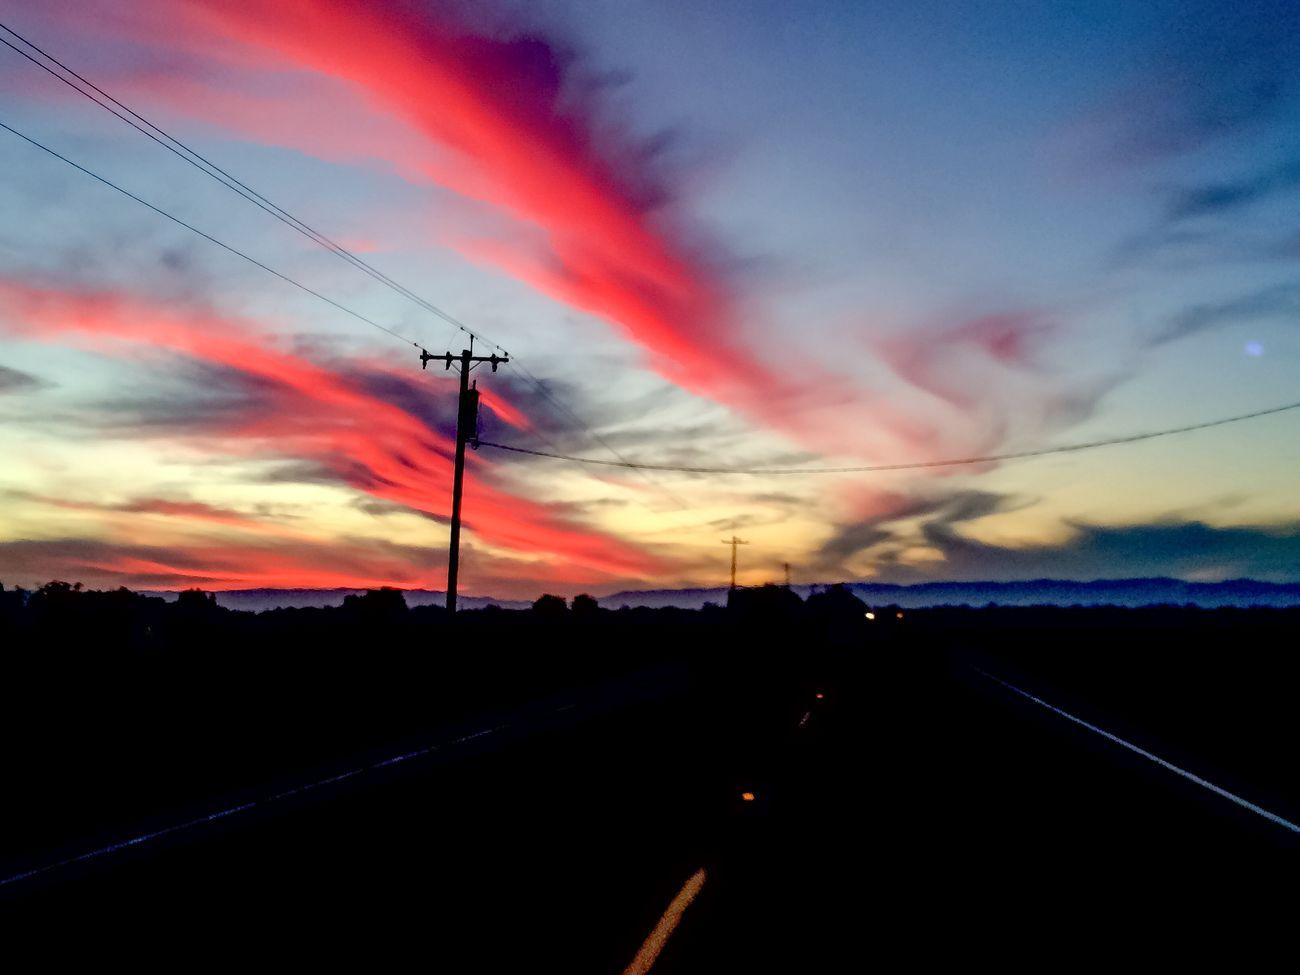 Driving near Winters, CA